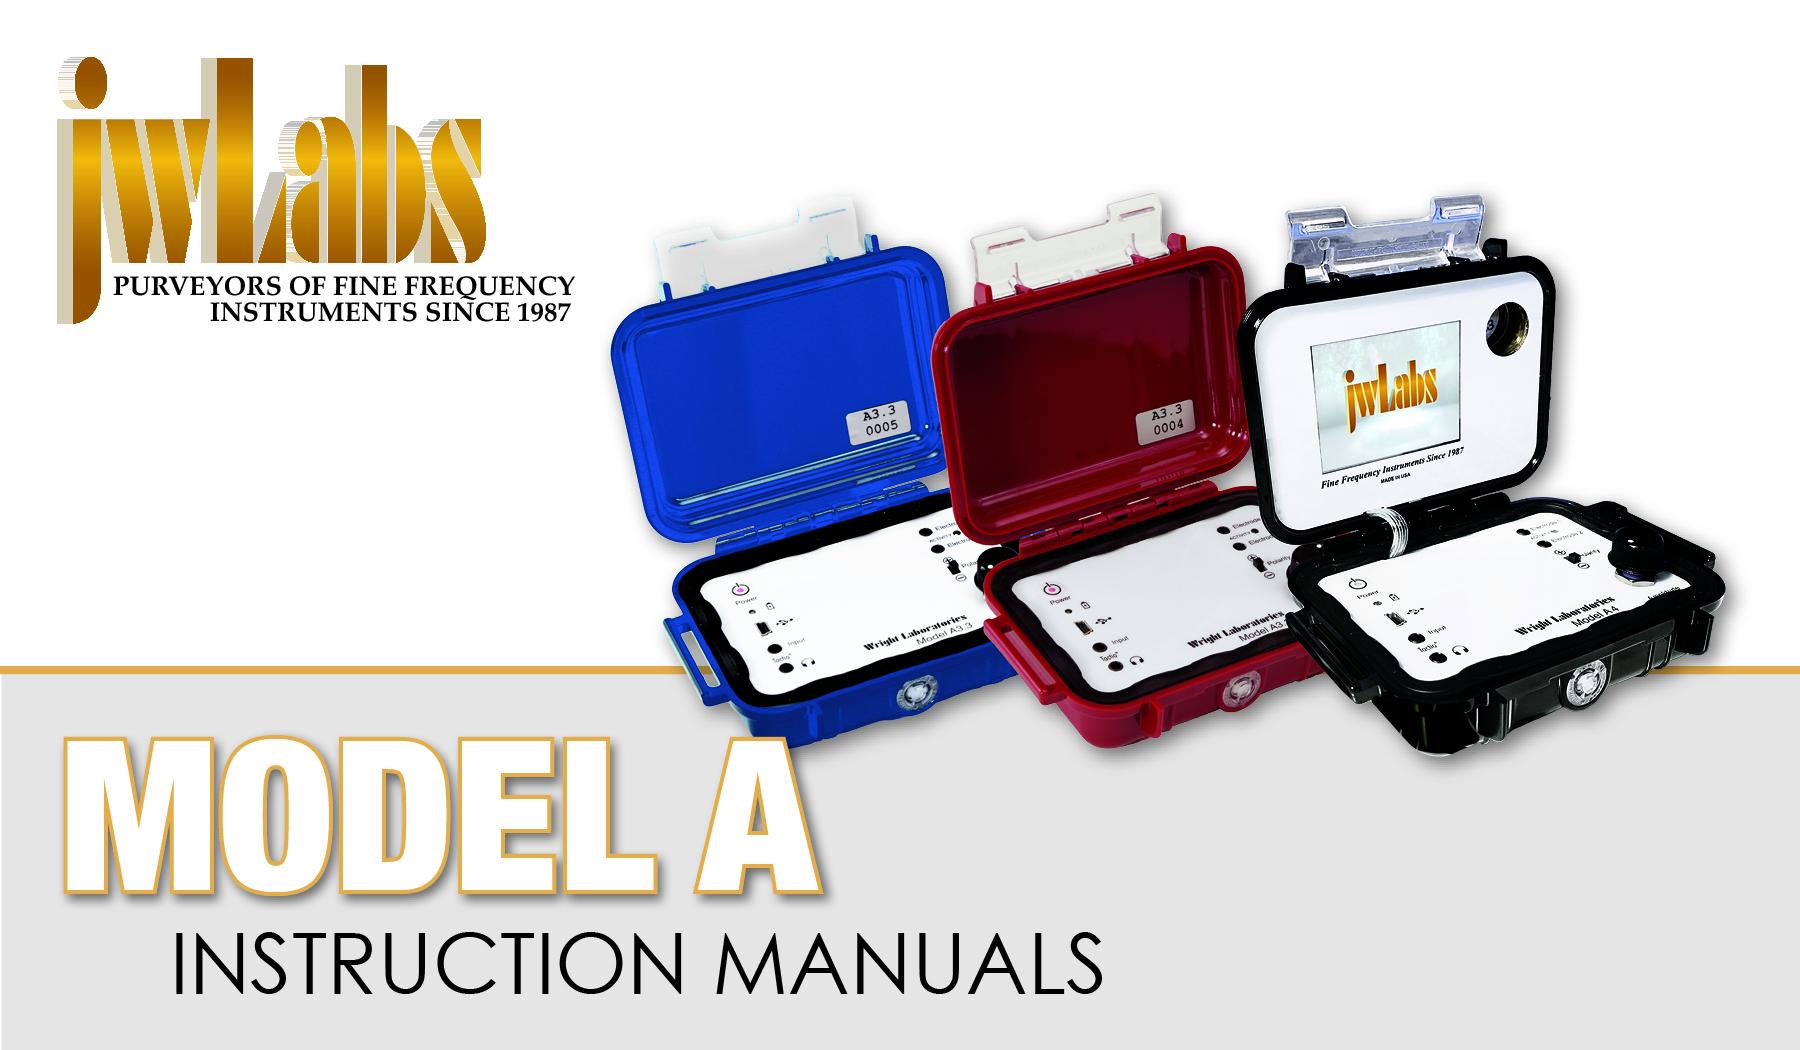 Instruction manual rife machine jwlabs model A